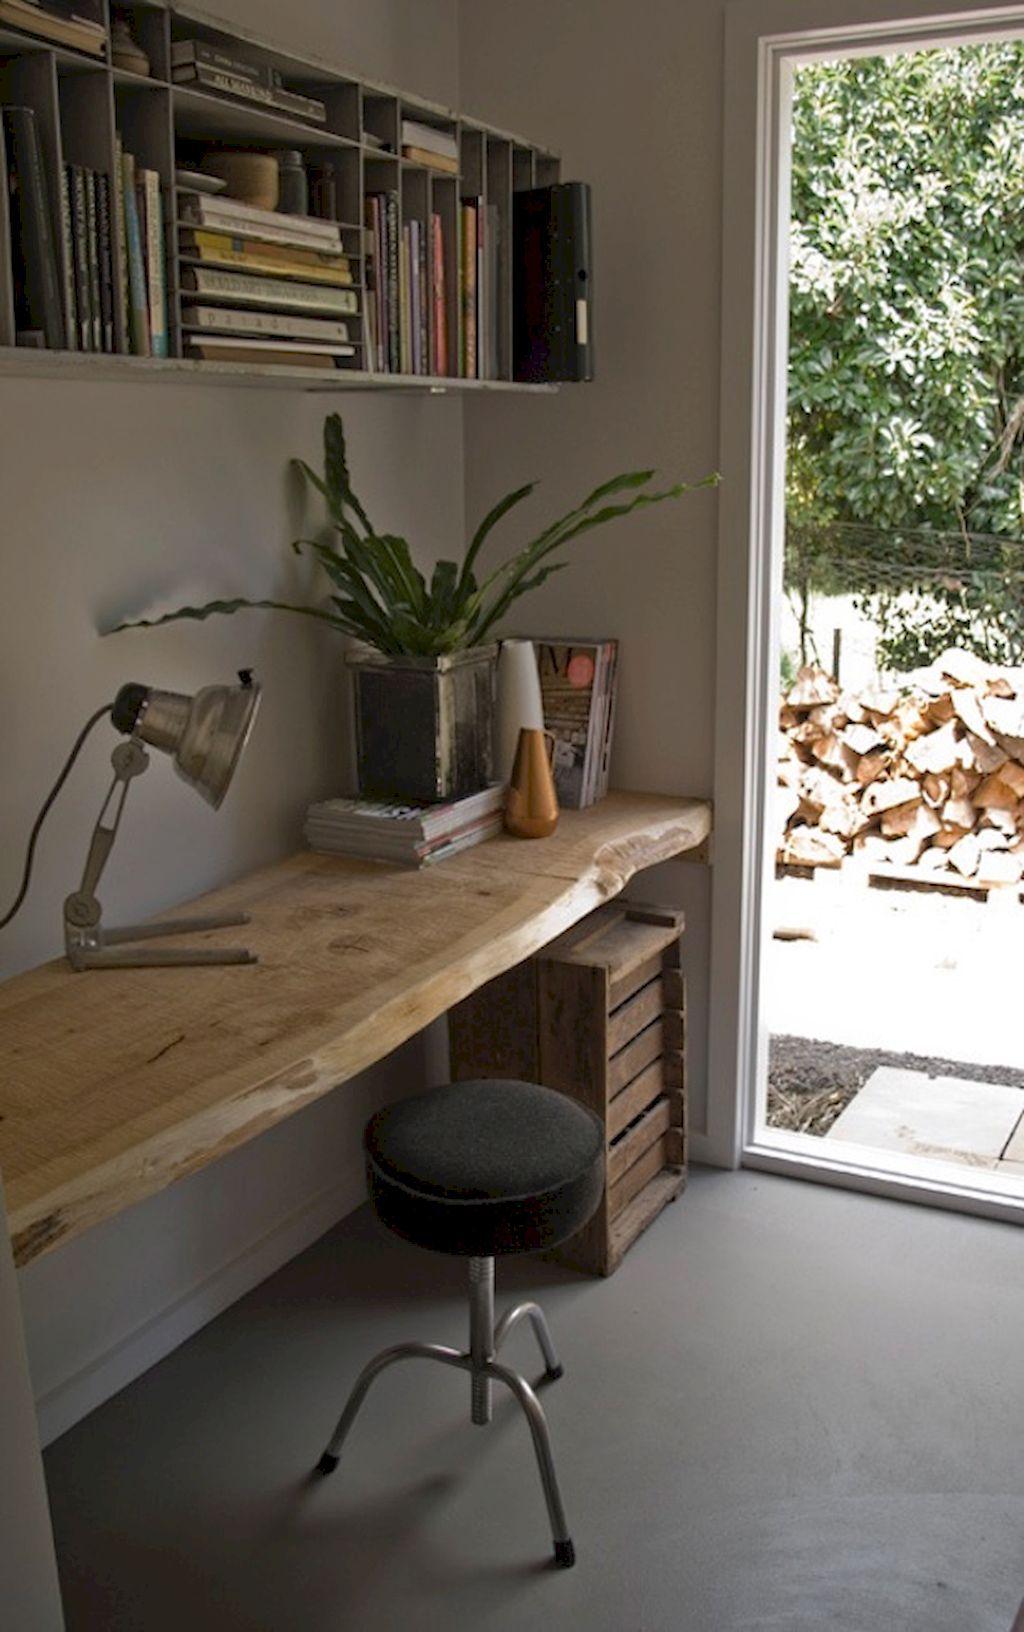 Adorable 70 Simple Home Office Decor Ideas